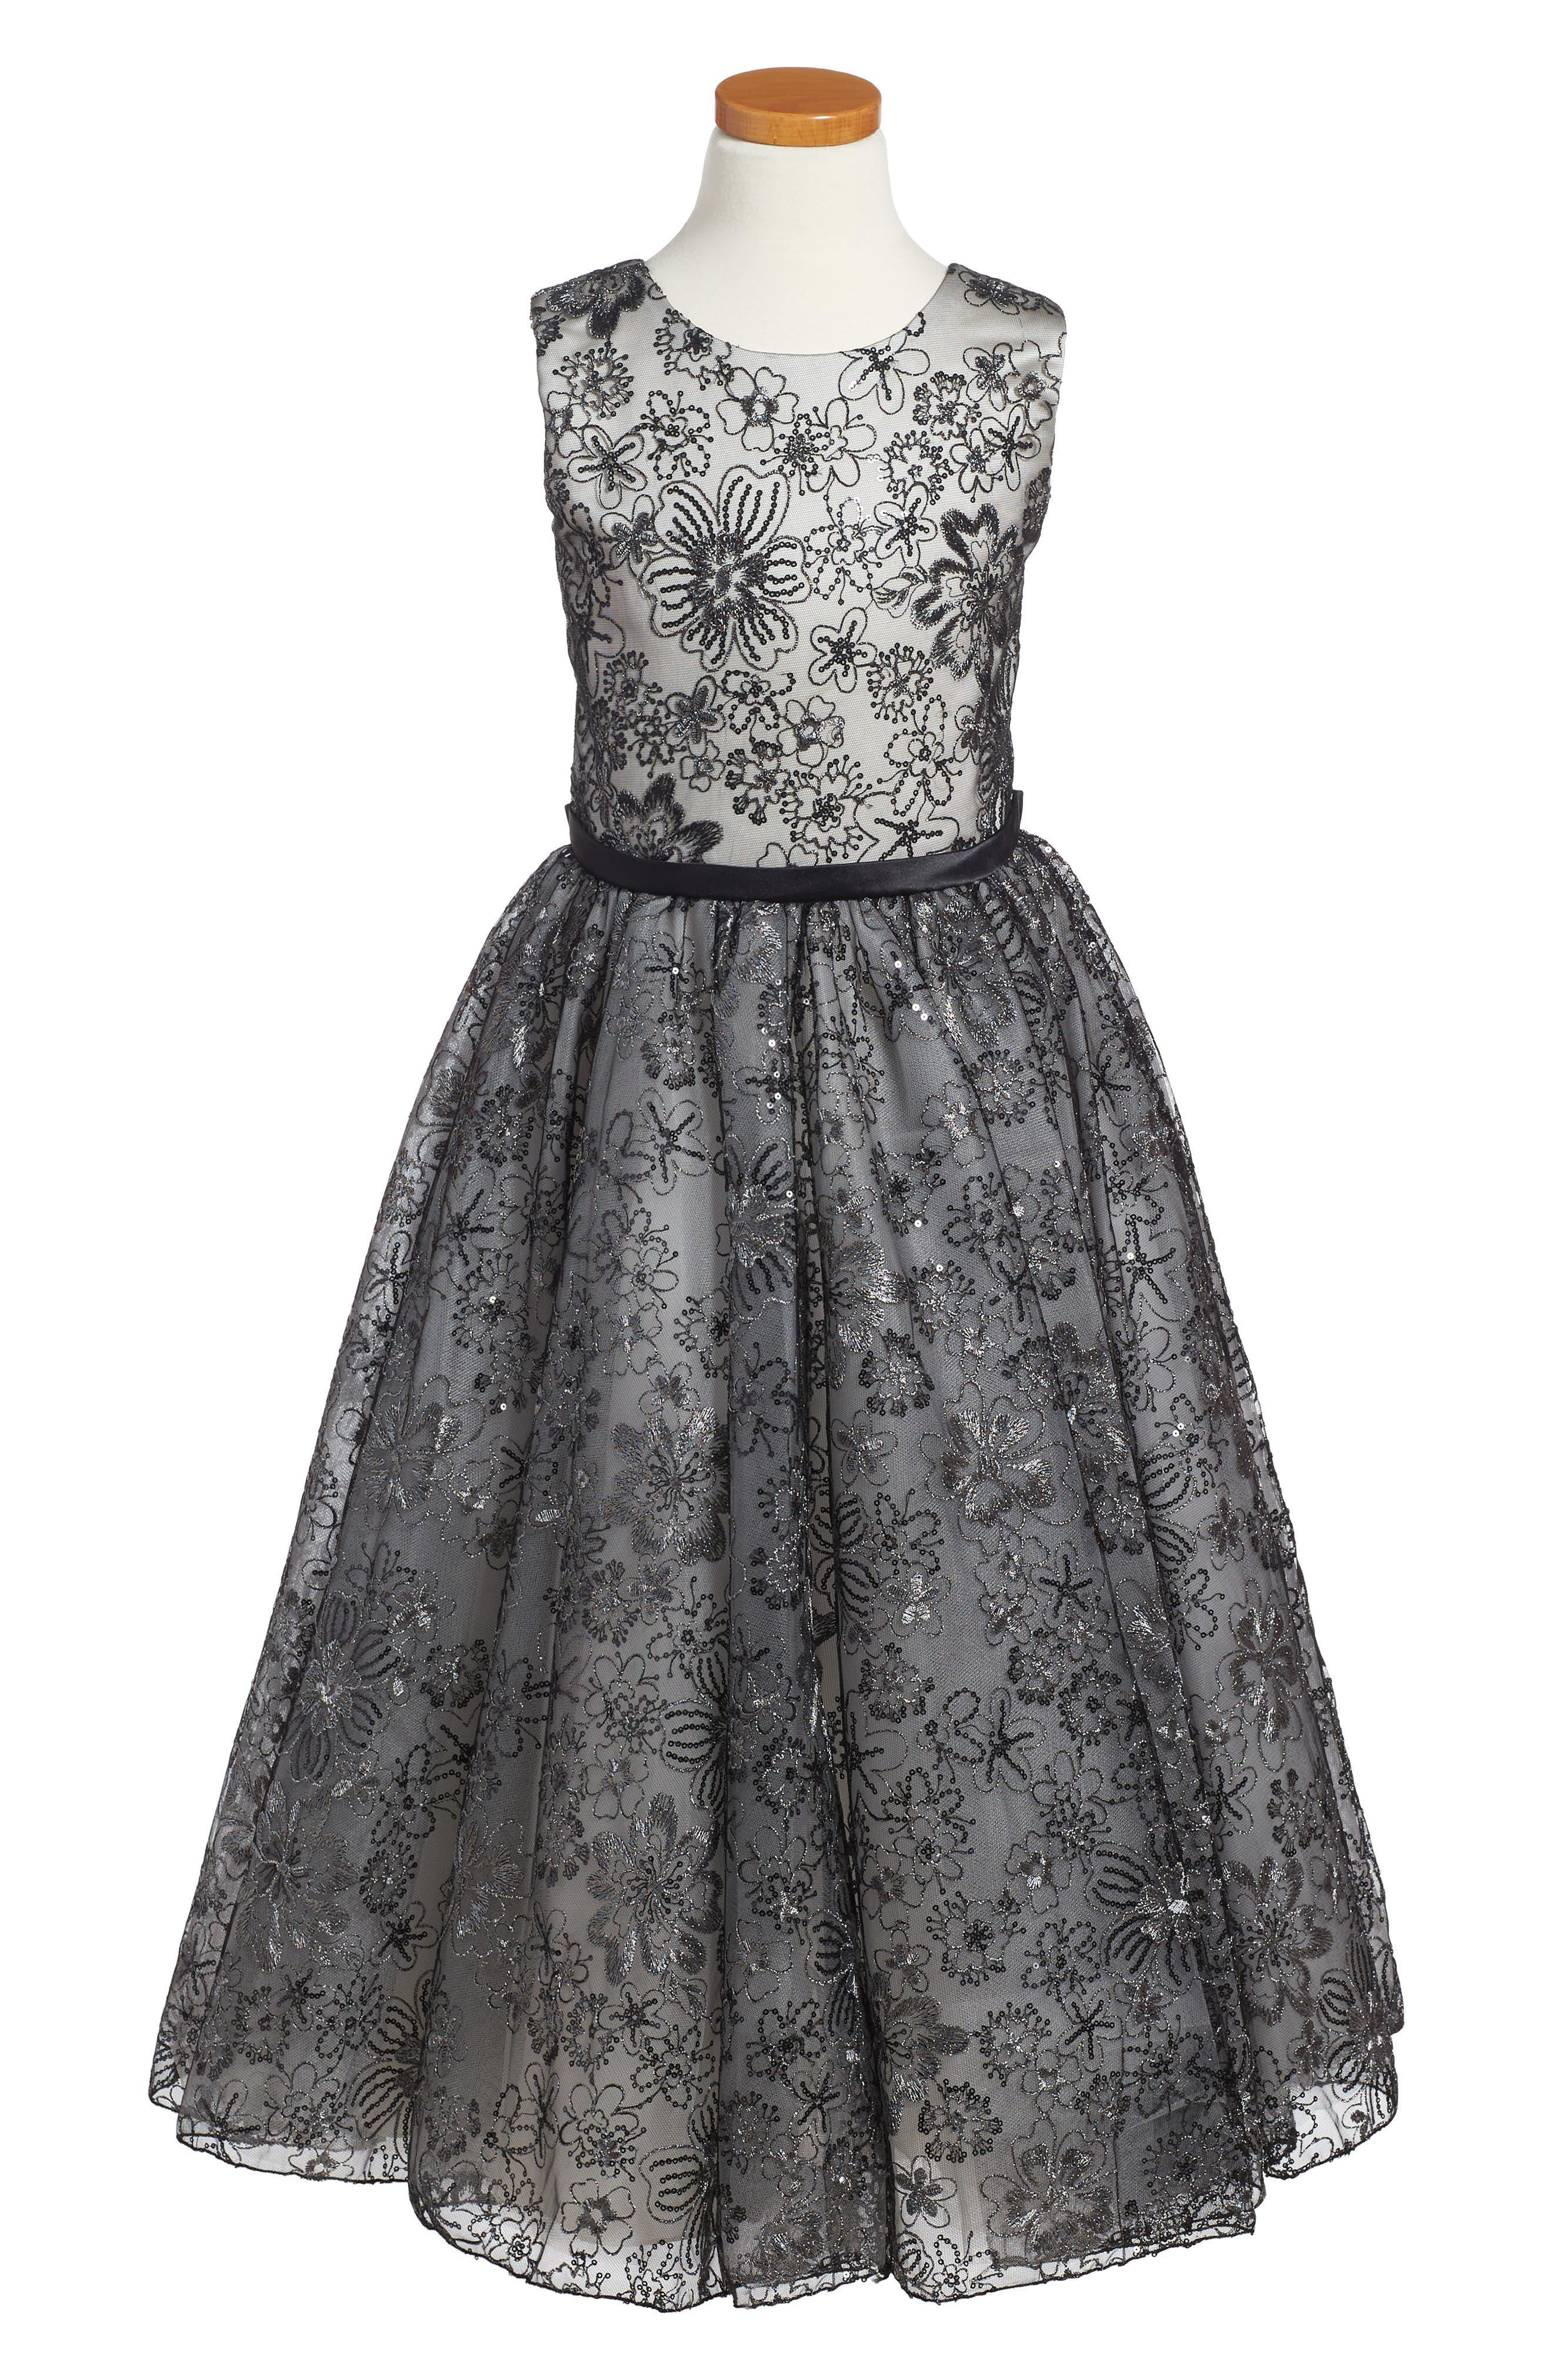 Sequin & Lace Dress,                             Main thumbnail 1, color,                             Black/ Ivory